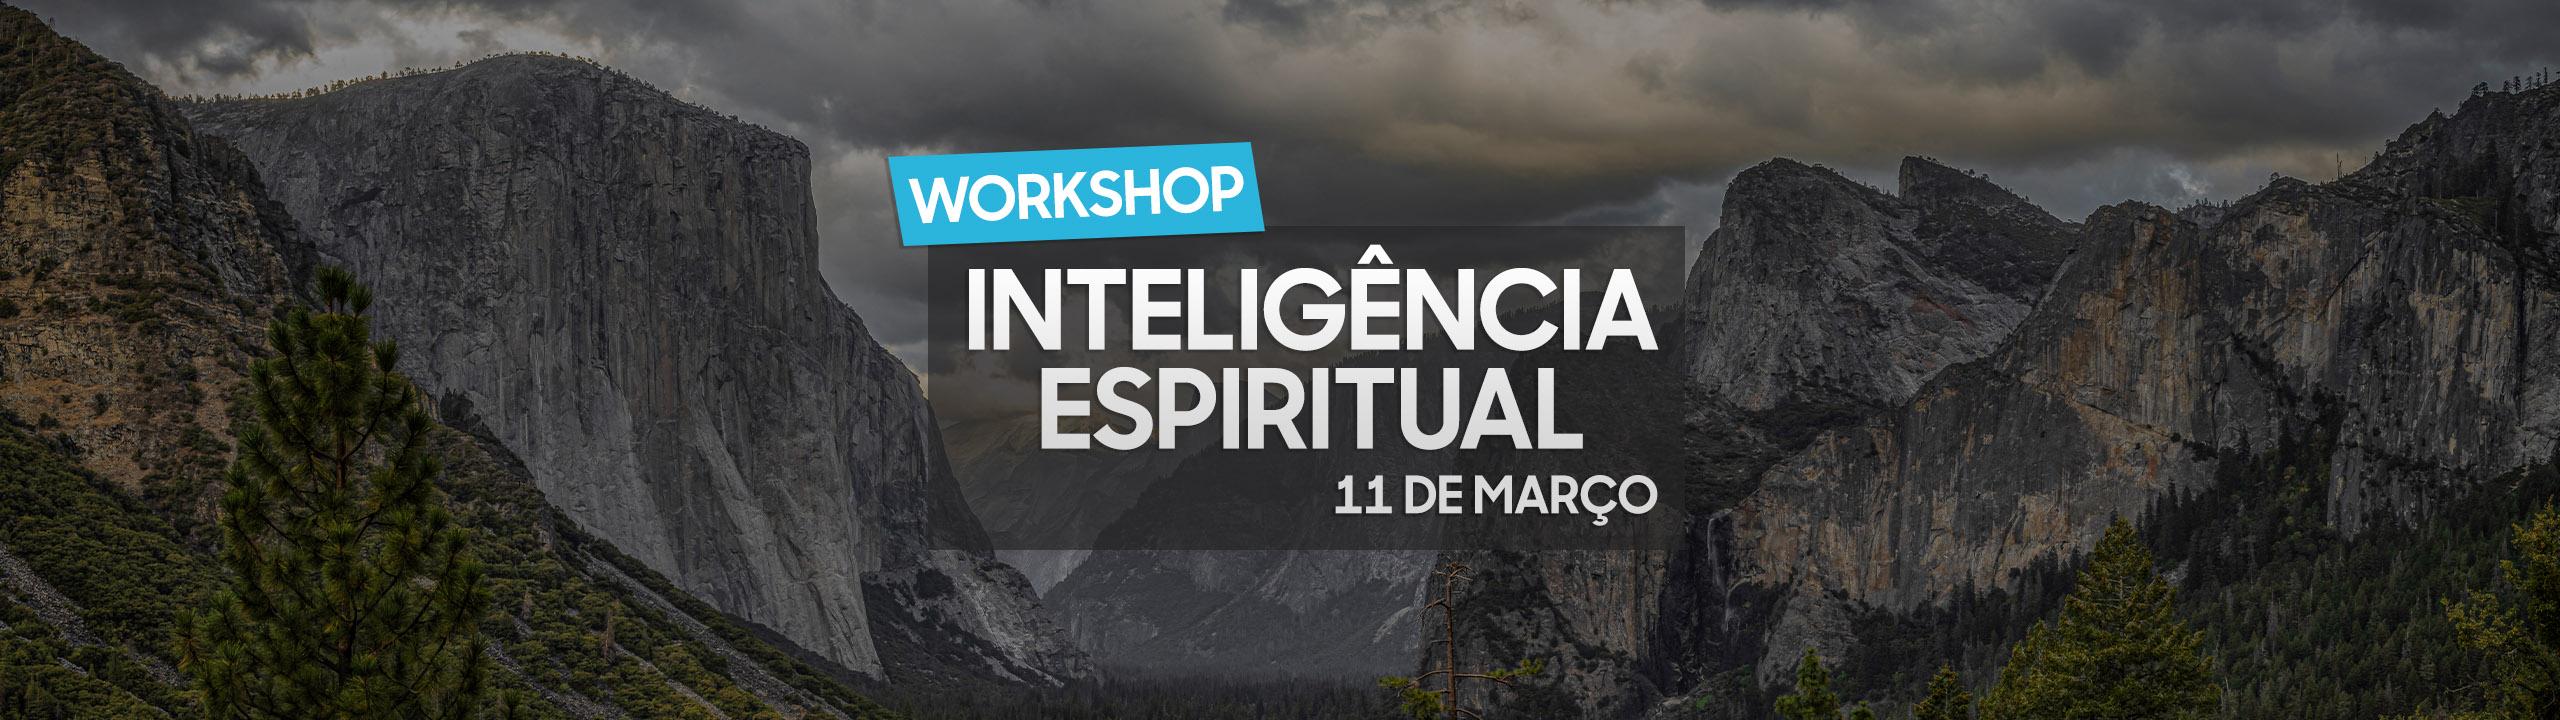 slider-worlshop-inteligencia-espiritual-11-marco-2020